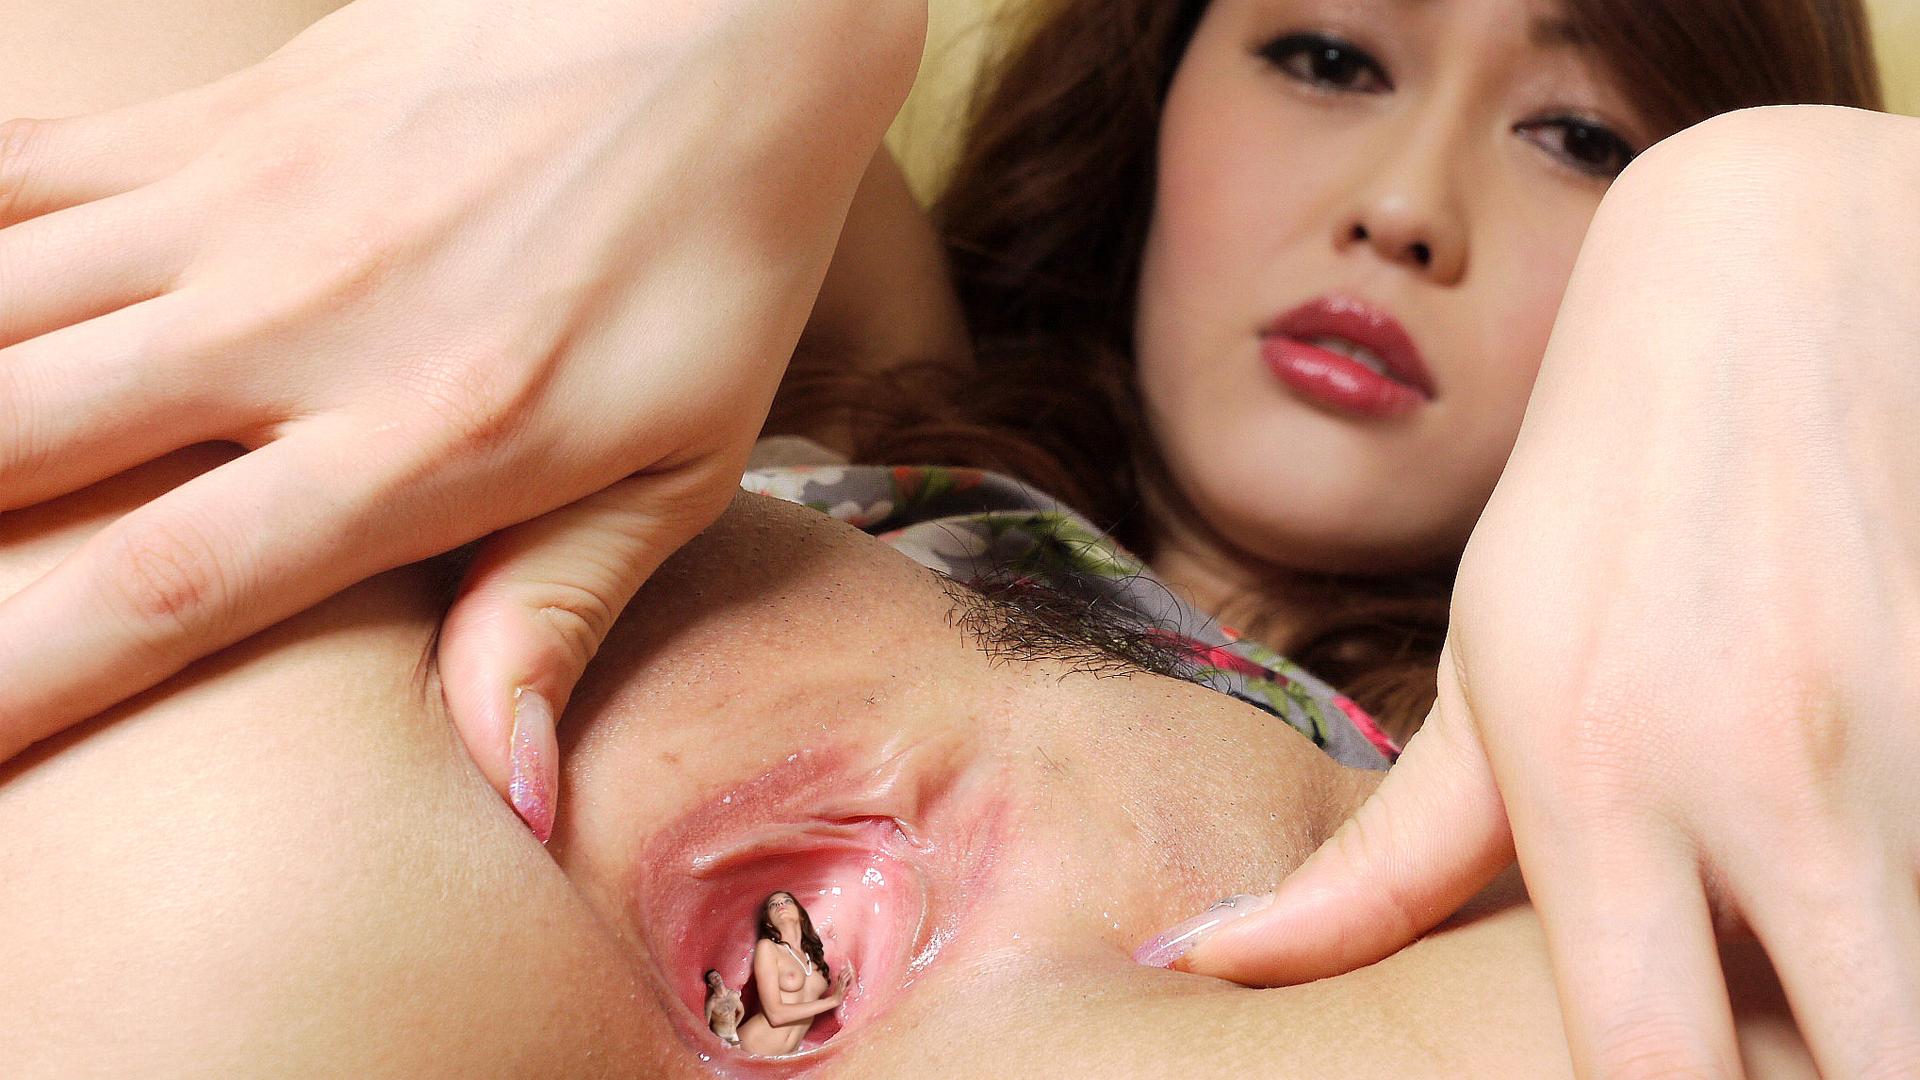 p t h c very young girl, teen sleepovers porn, kareena nude hardcore fucked, ...